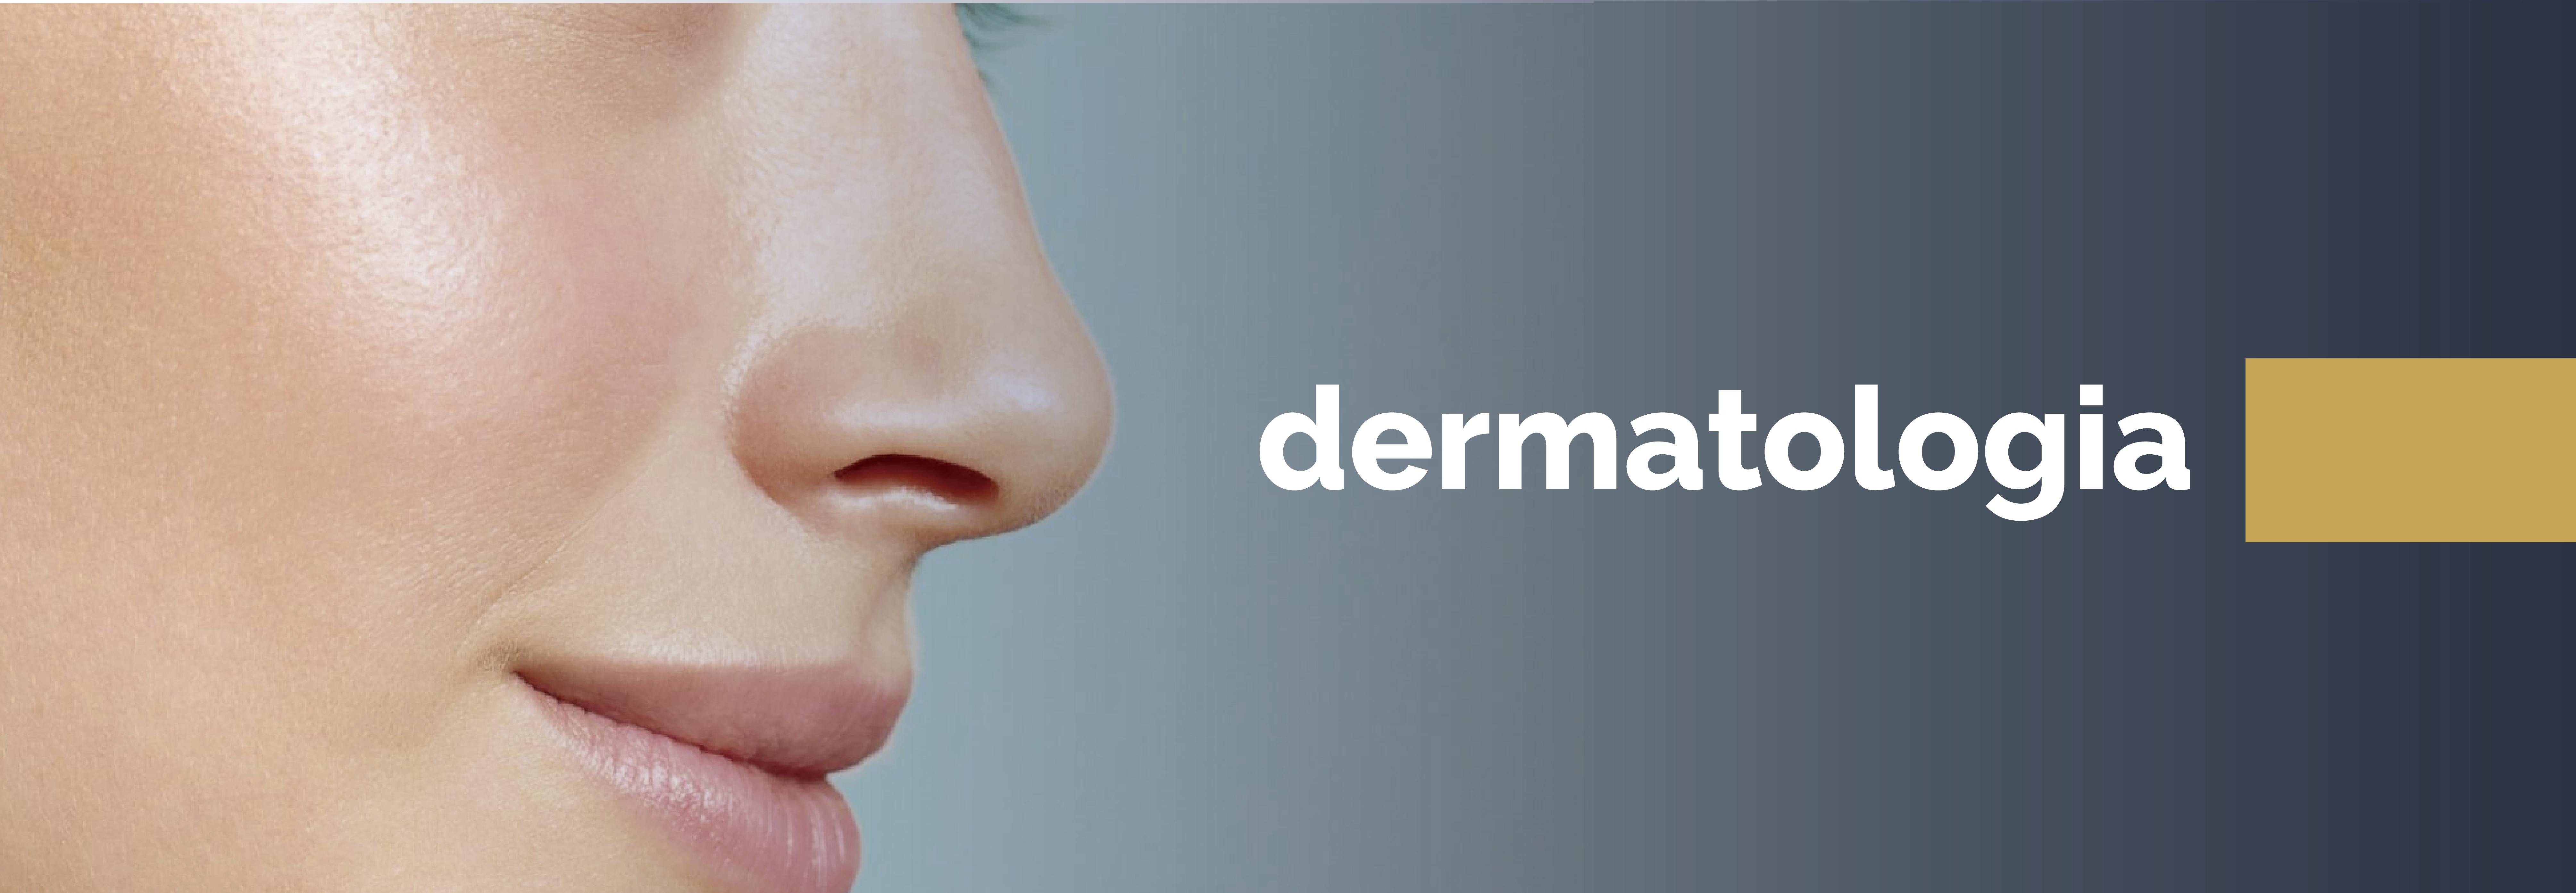 dermatologista uberlandia